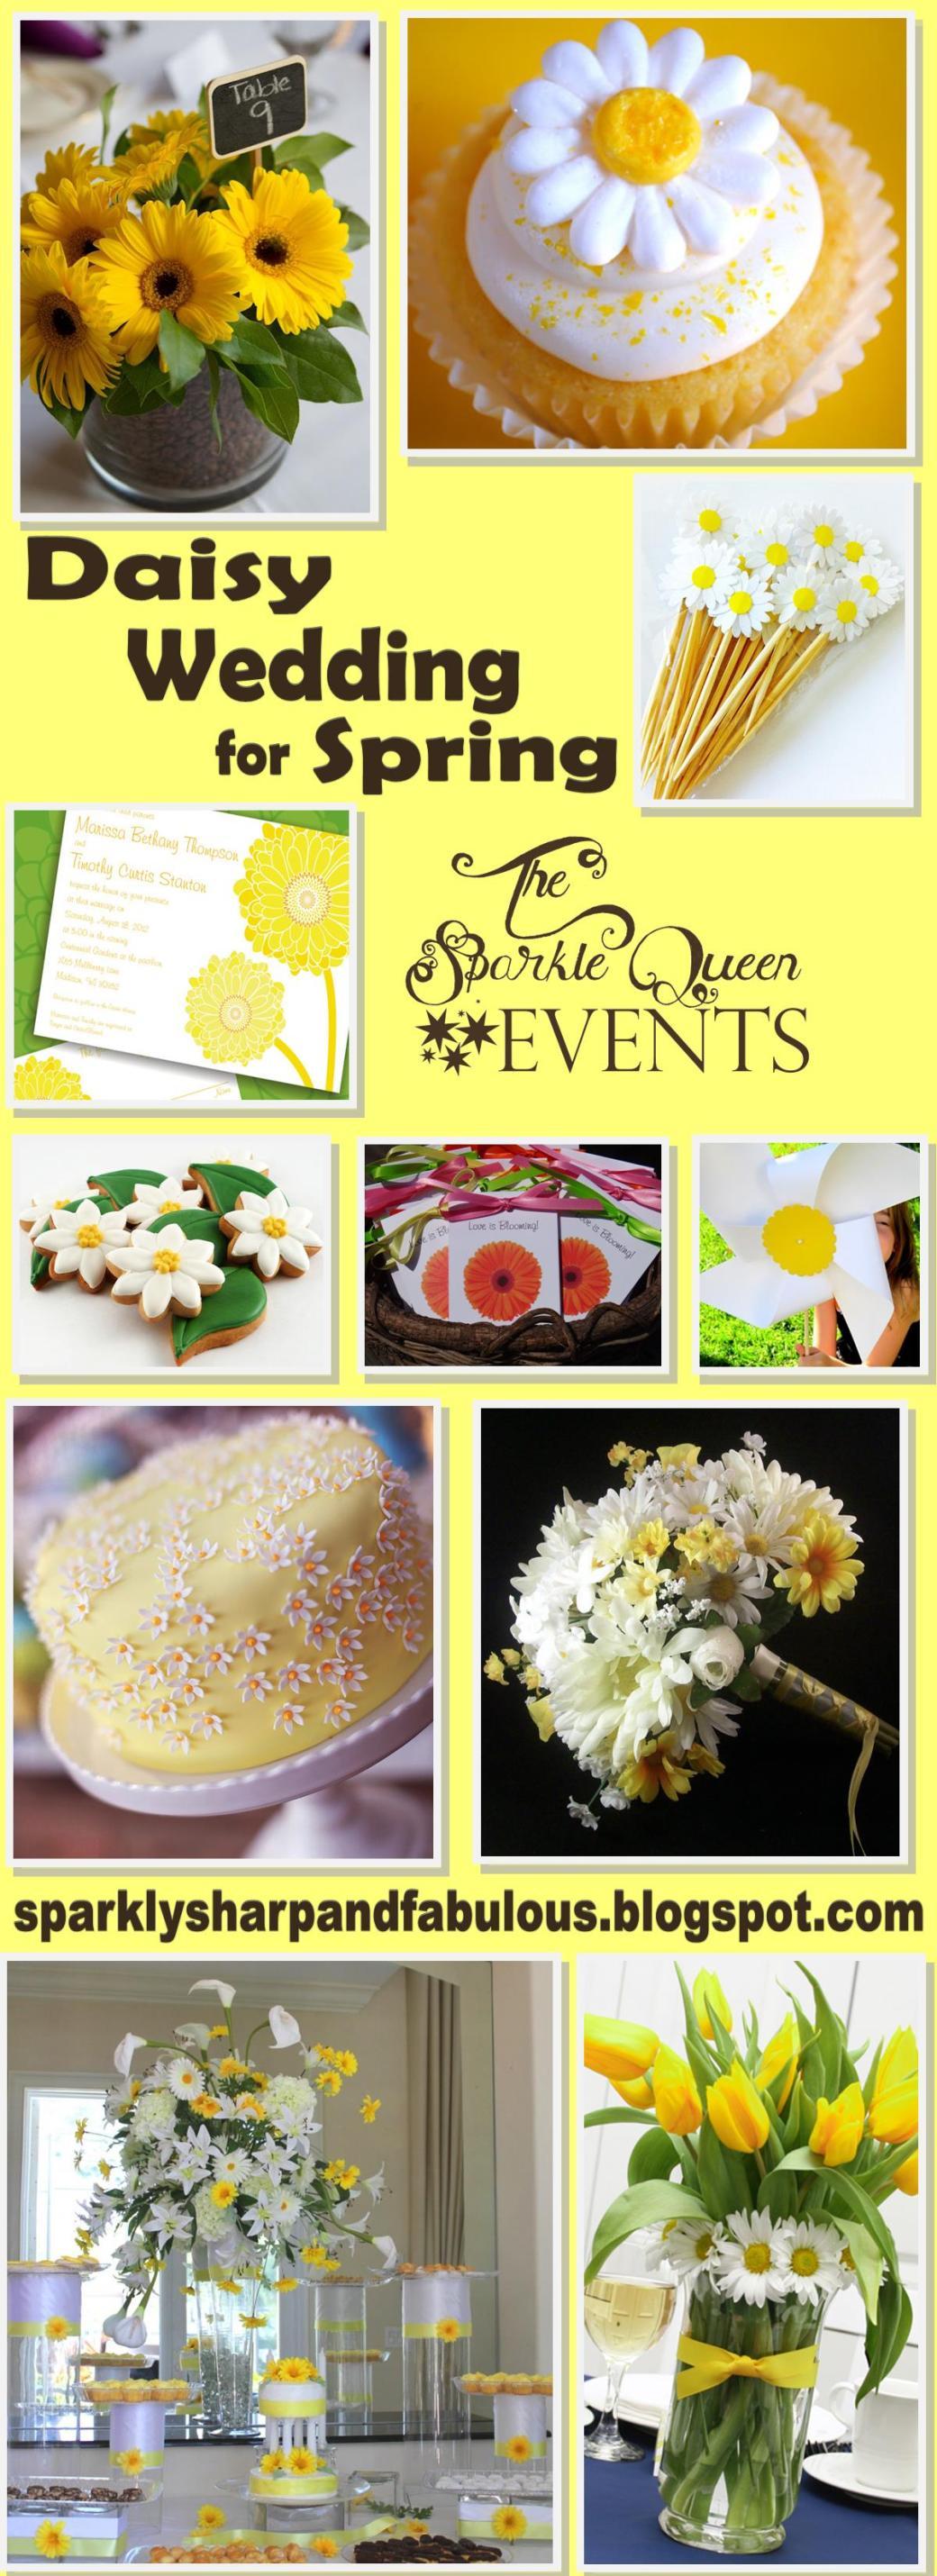 Daisy Spring Wedding